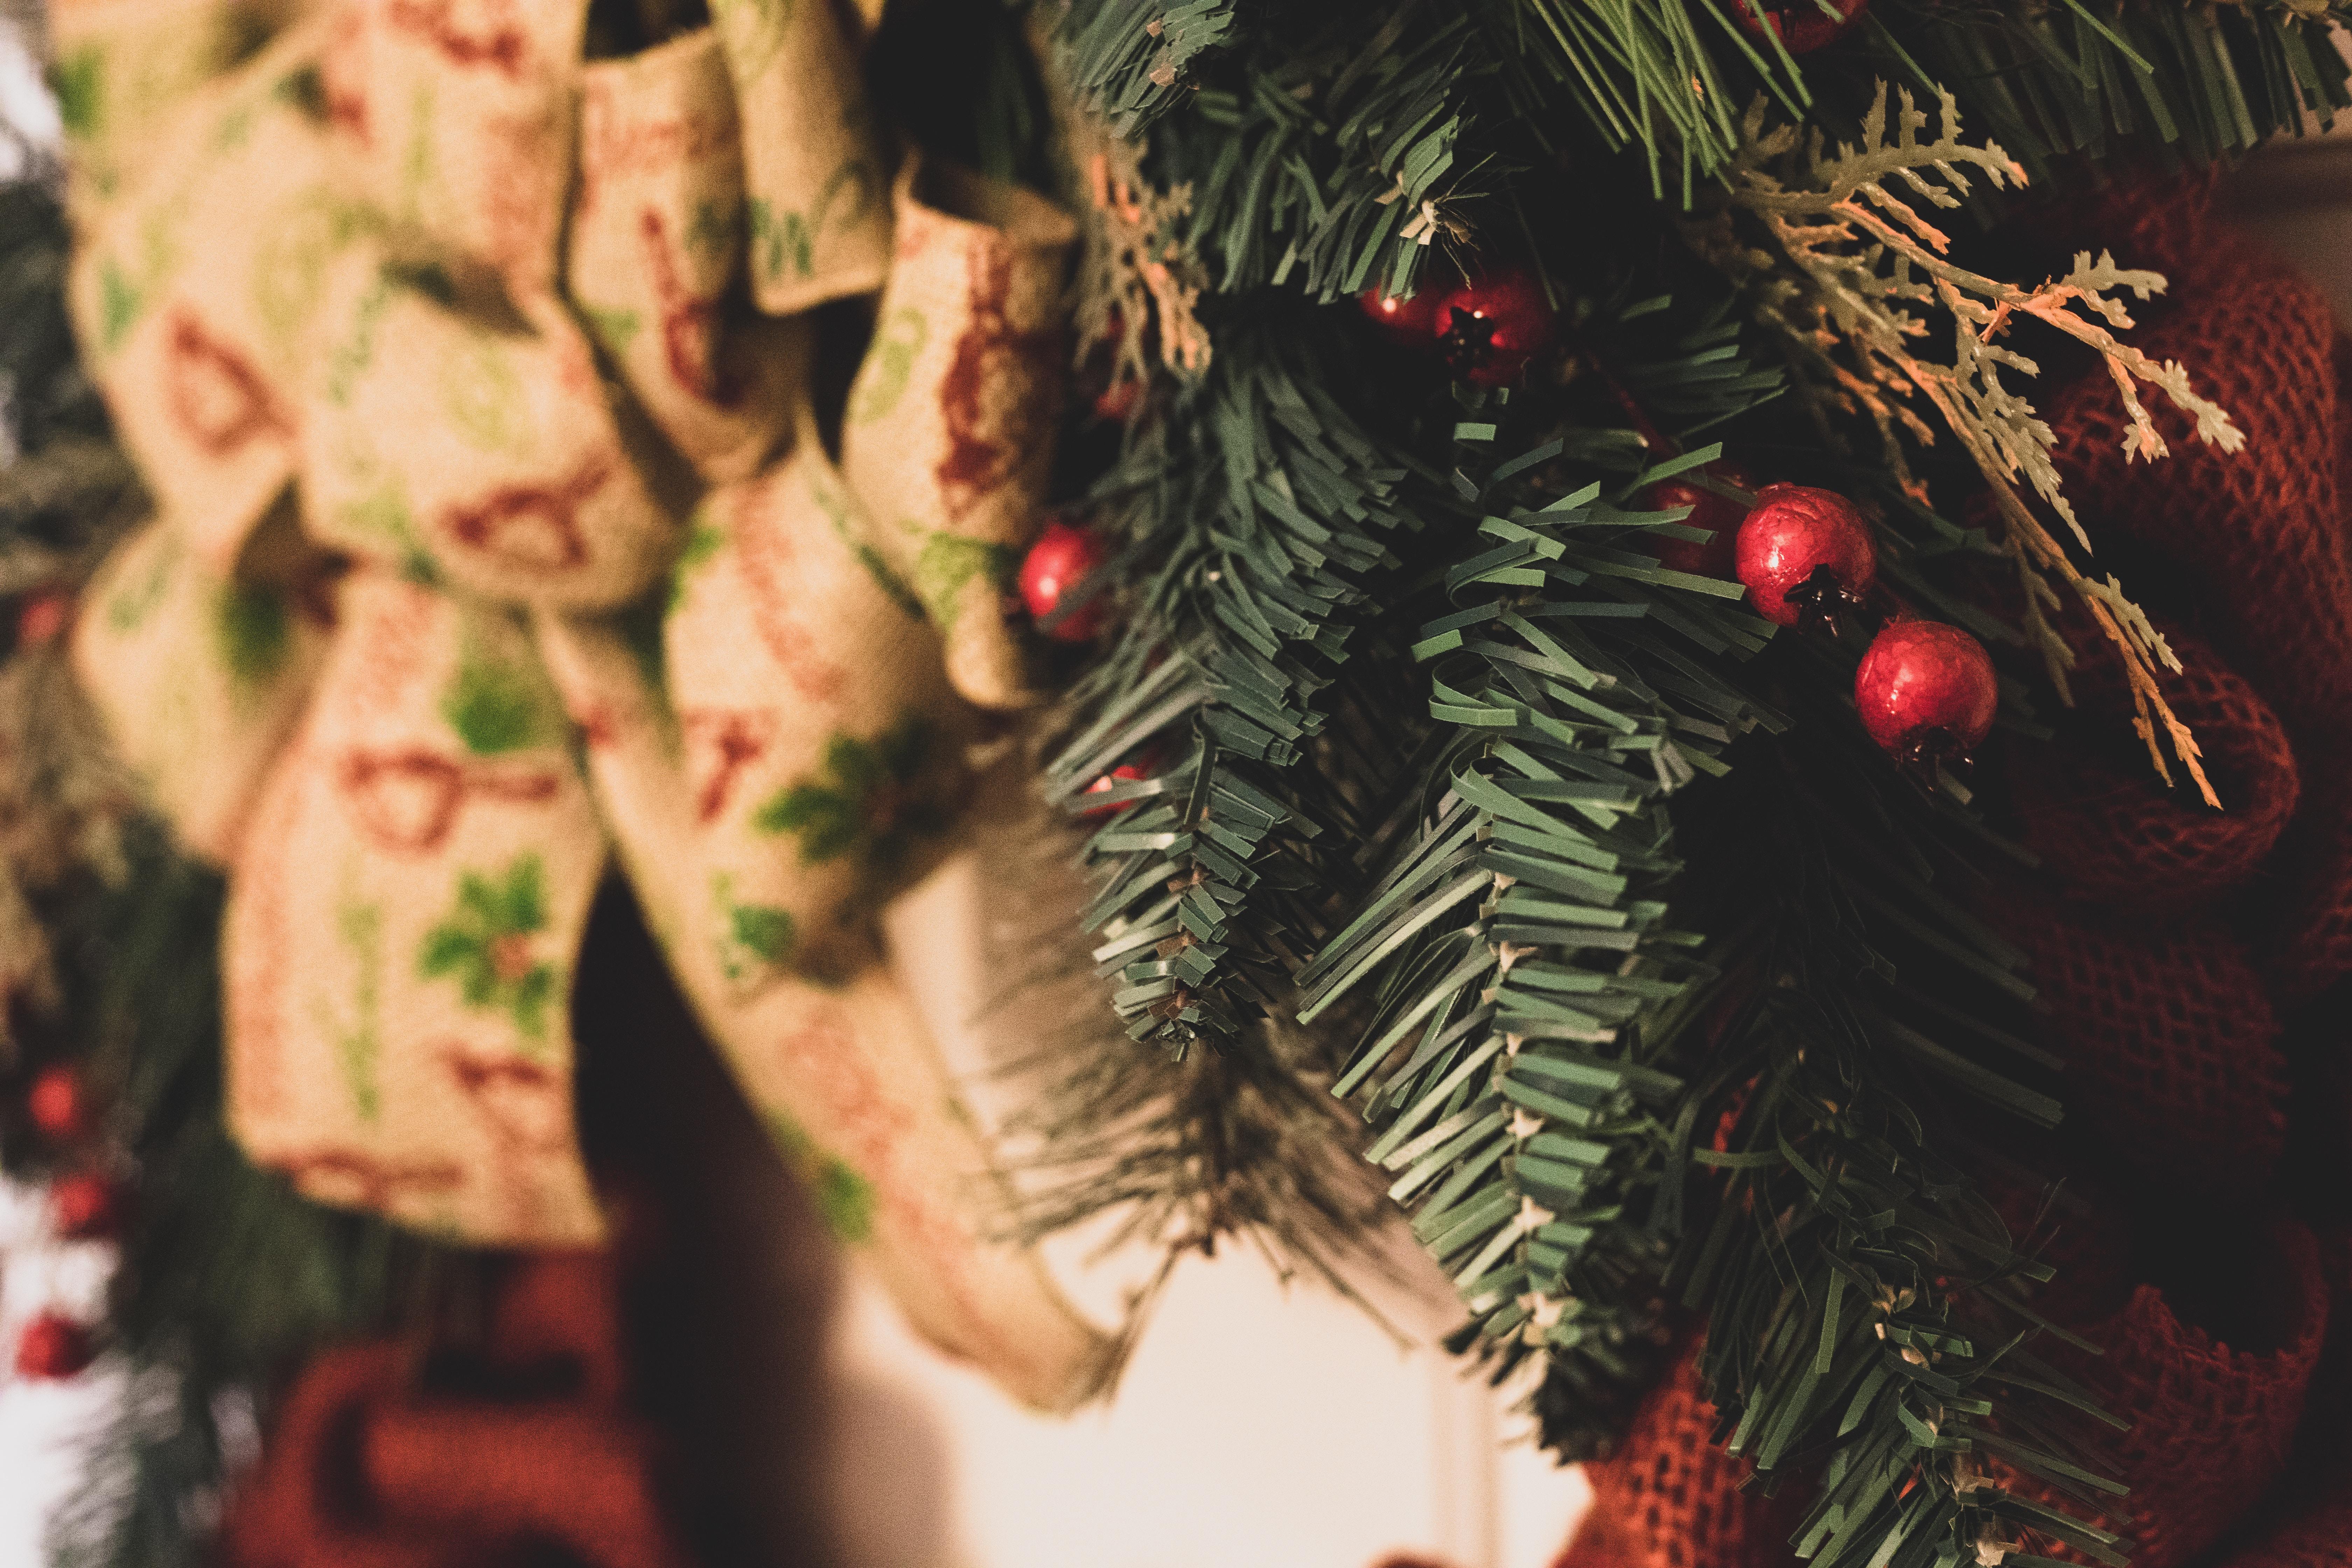 closeup photography of mistletoe